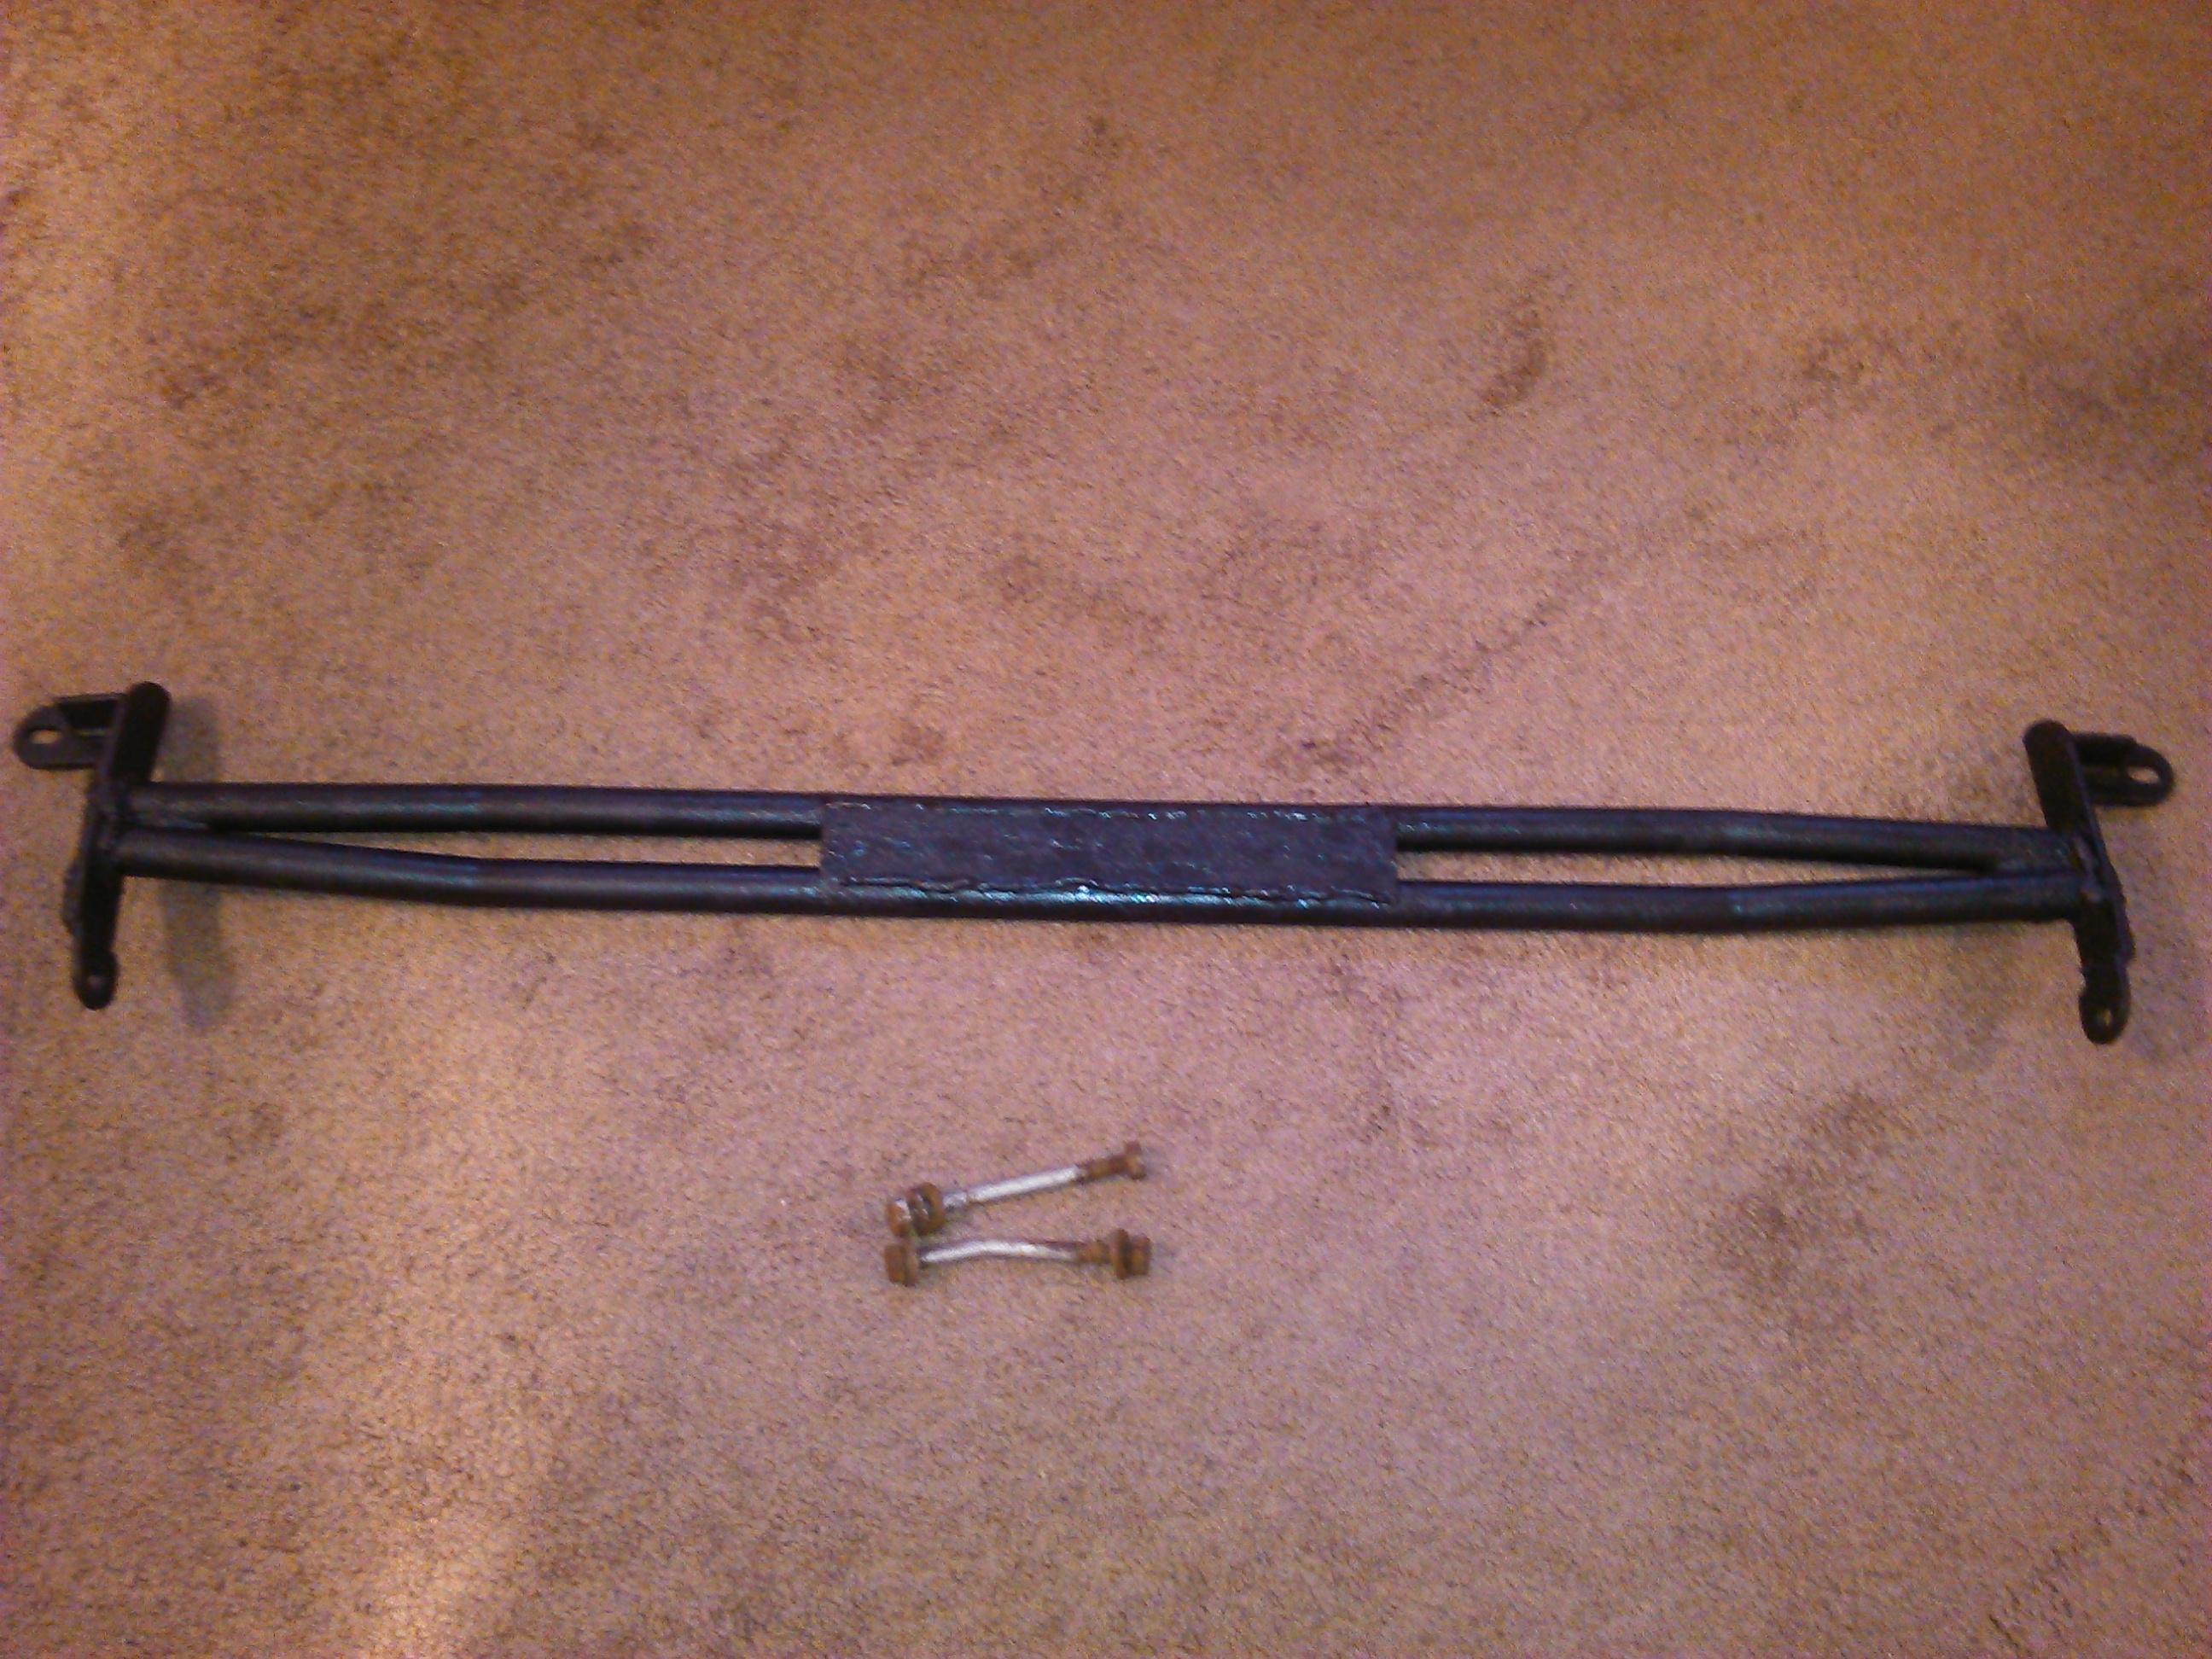 Mantis rear stabilizer bar for sale $ 60 bucks plus shipping-img_20150707_165222.jpg